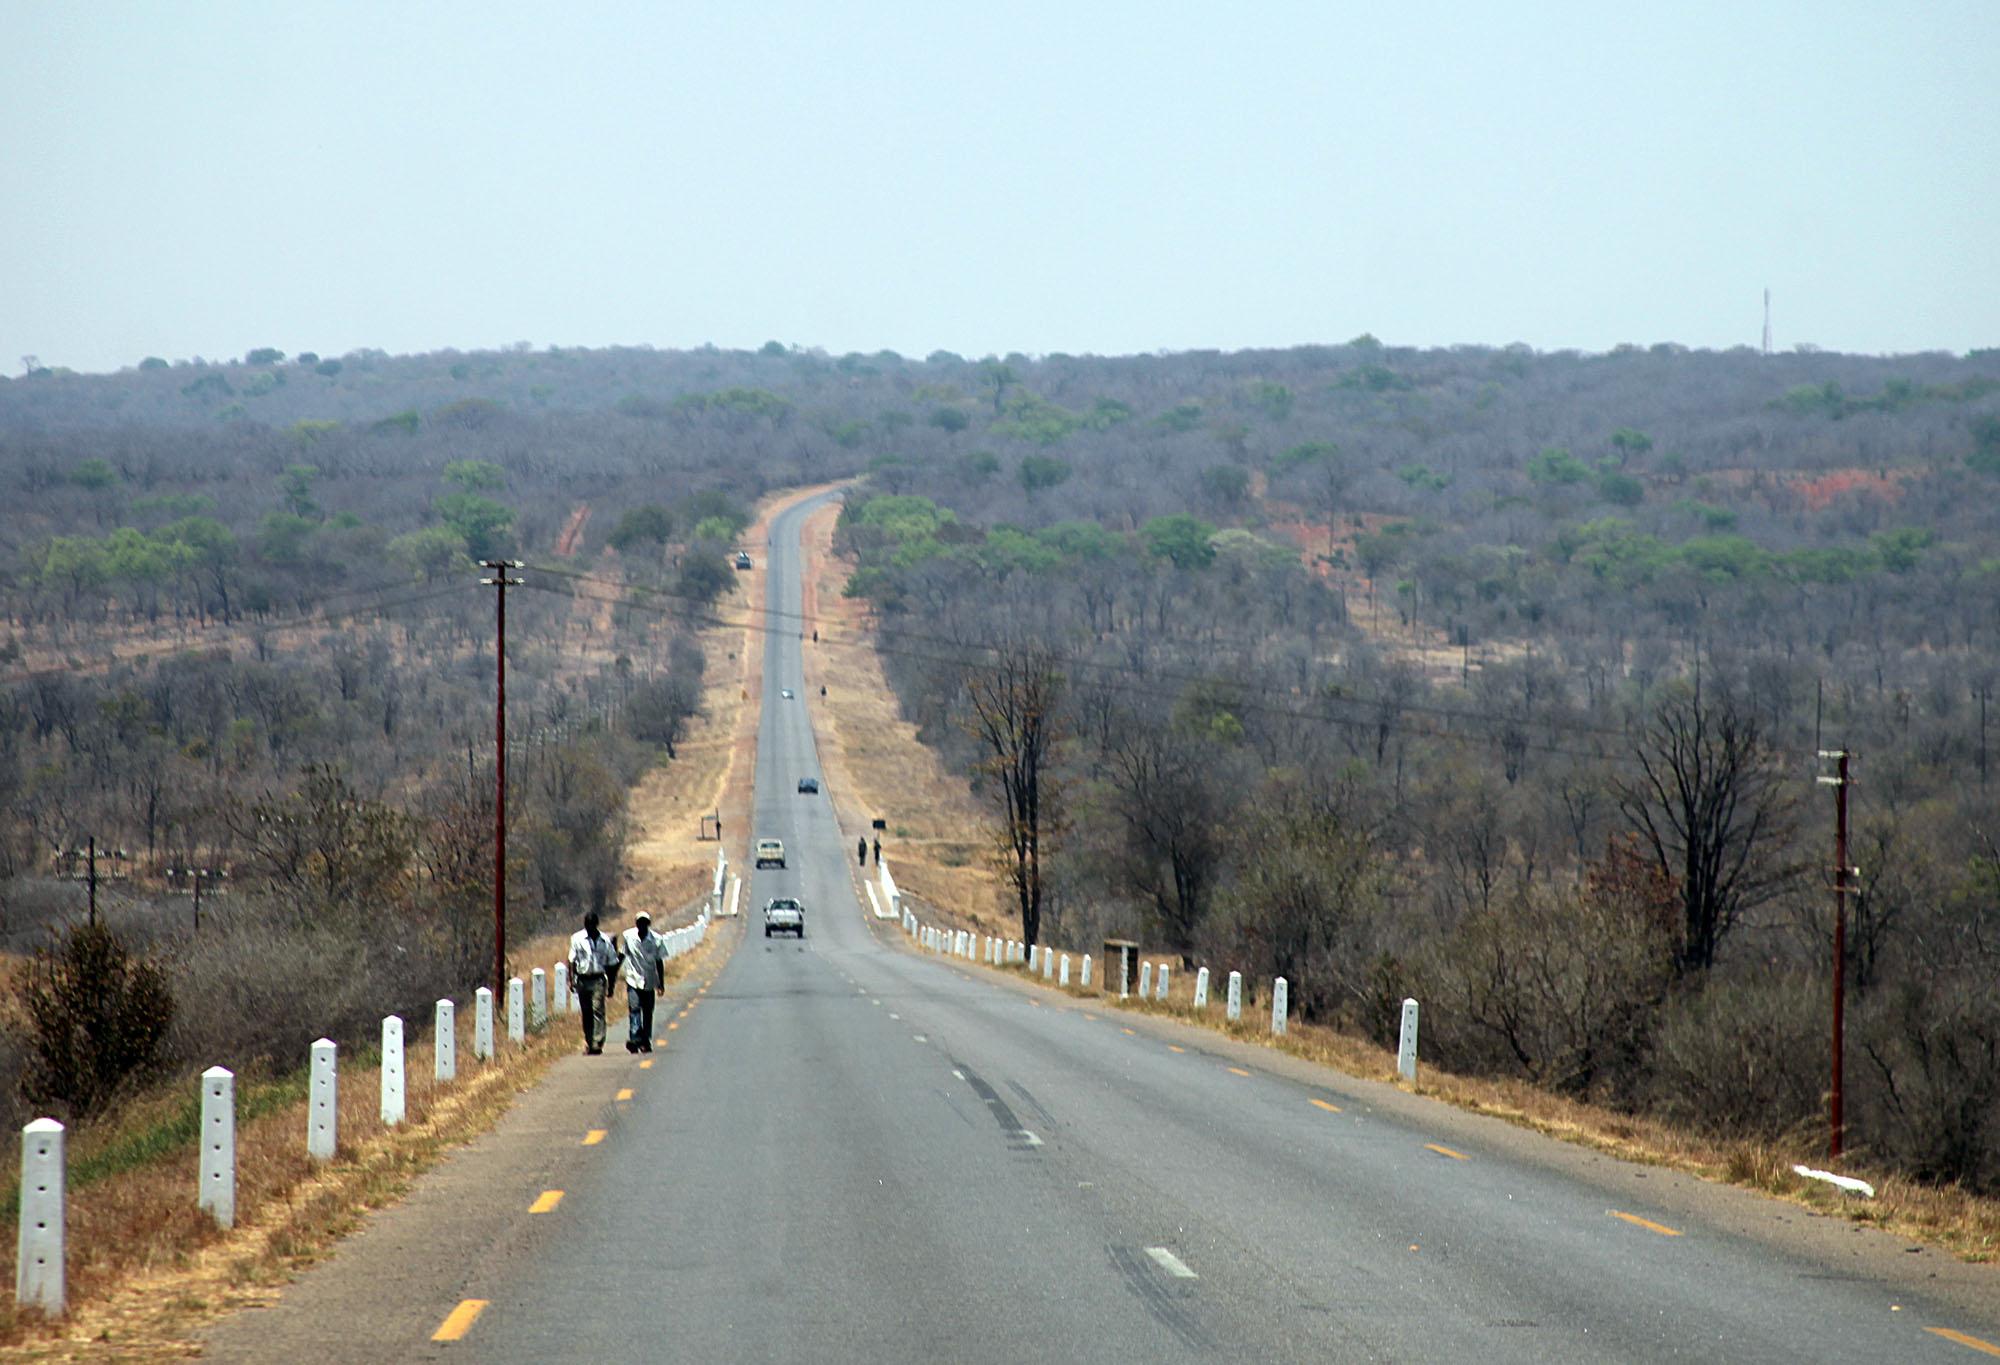 The road into Zimbabwe